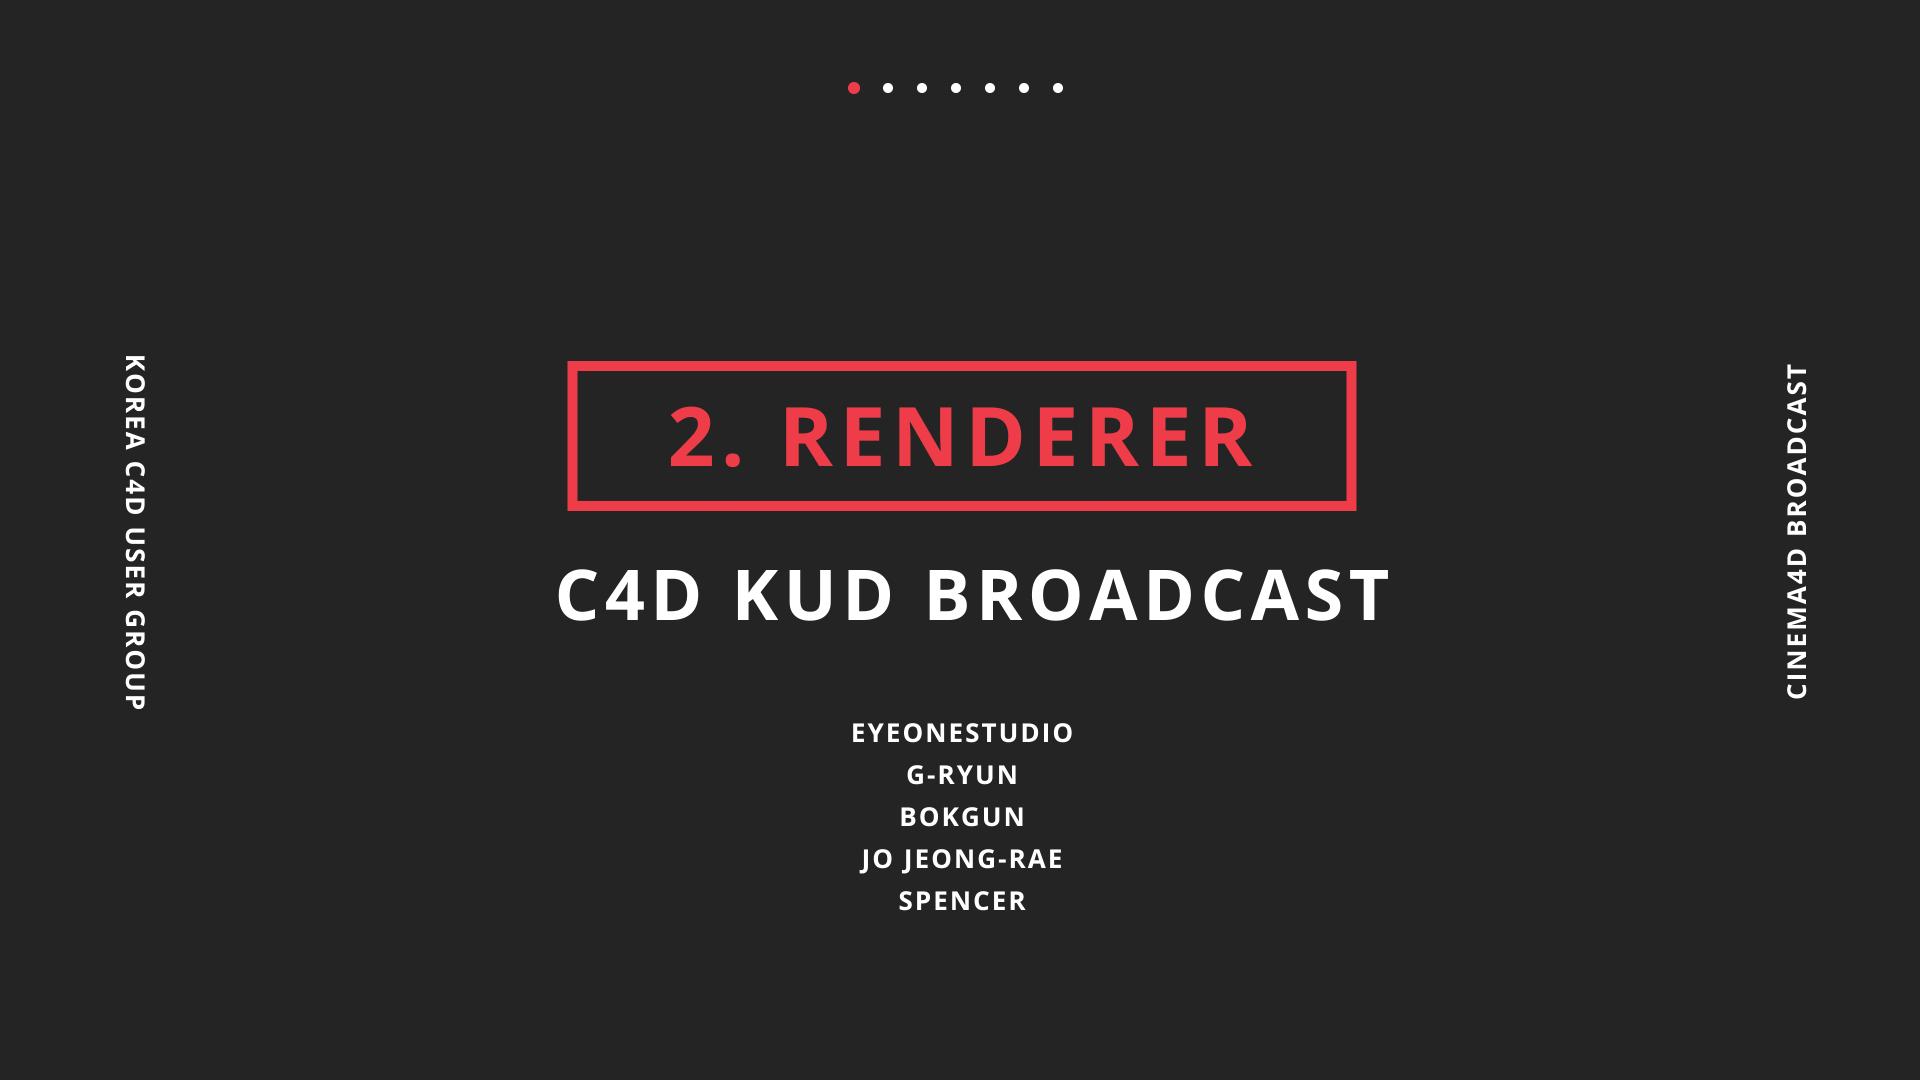 C4D_KUG_BroadCast_2m_00000.png